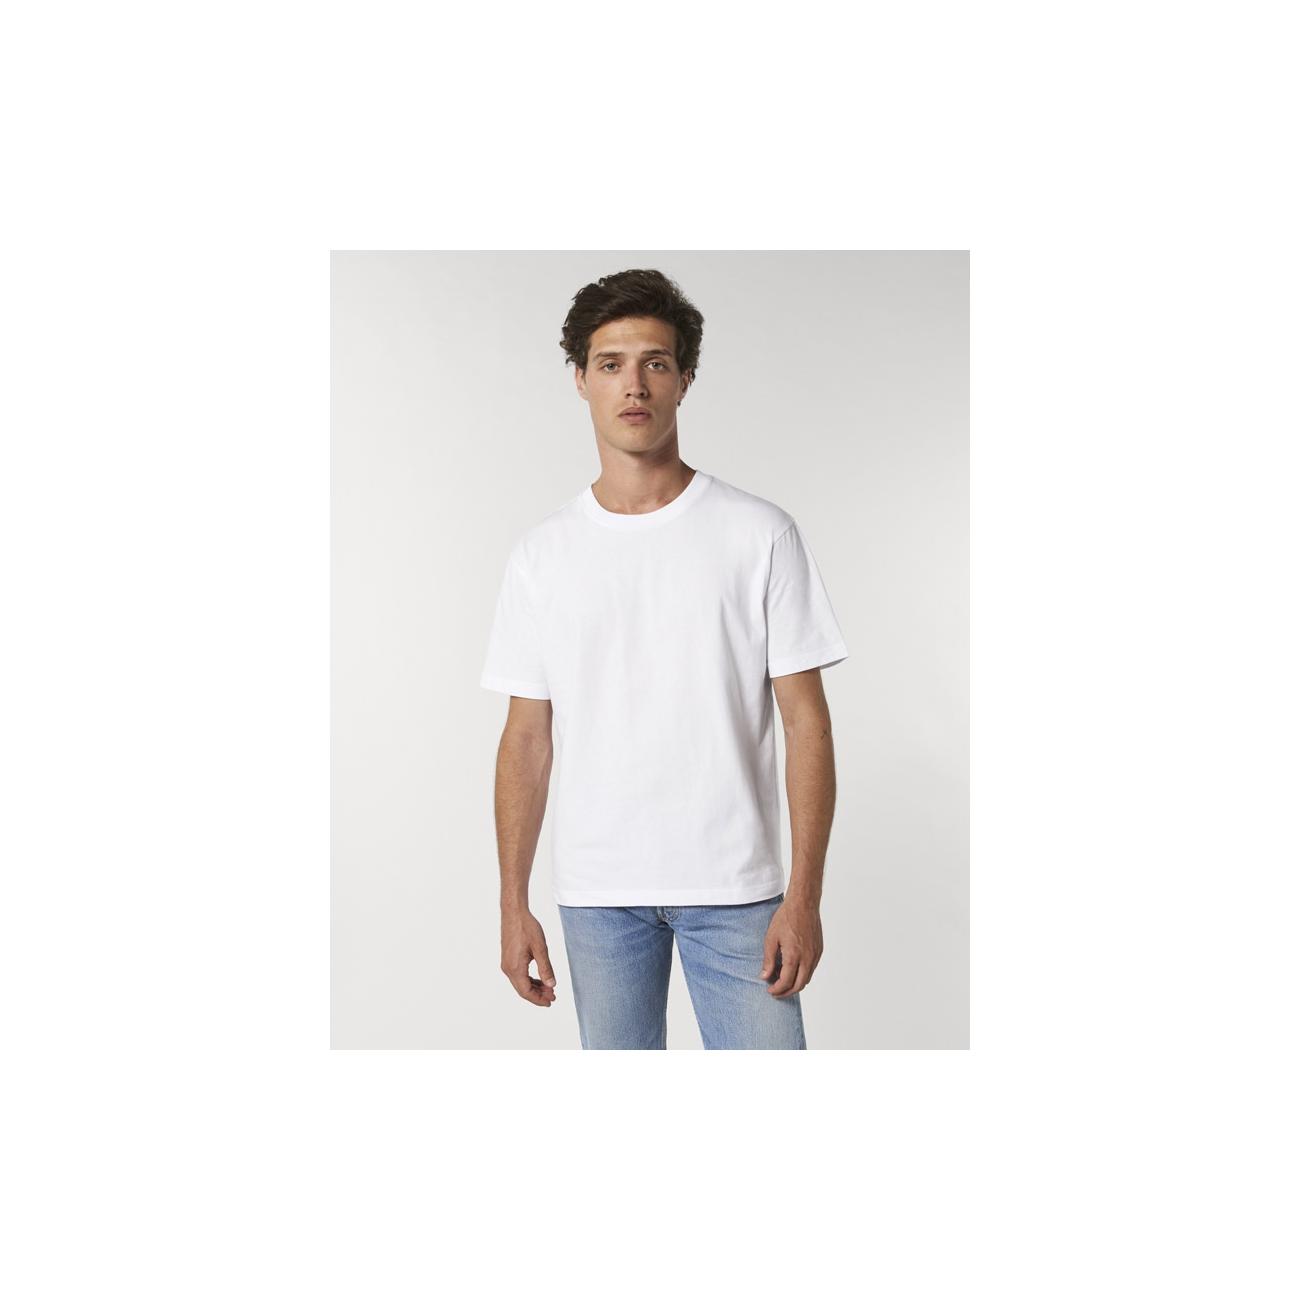 https://tee-shirt-bio.com/9638-thickbox_default/tee-shirt-coton-bio-coupe-ample-homme-blanc-.jpg